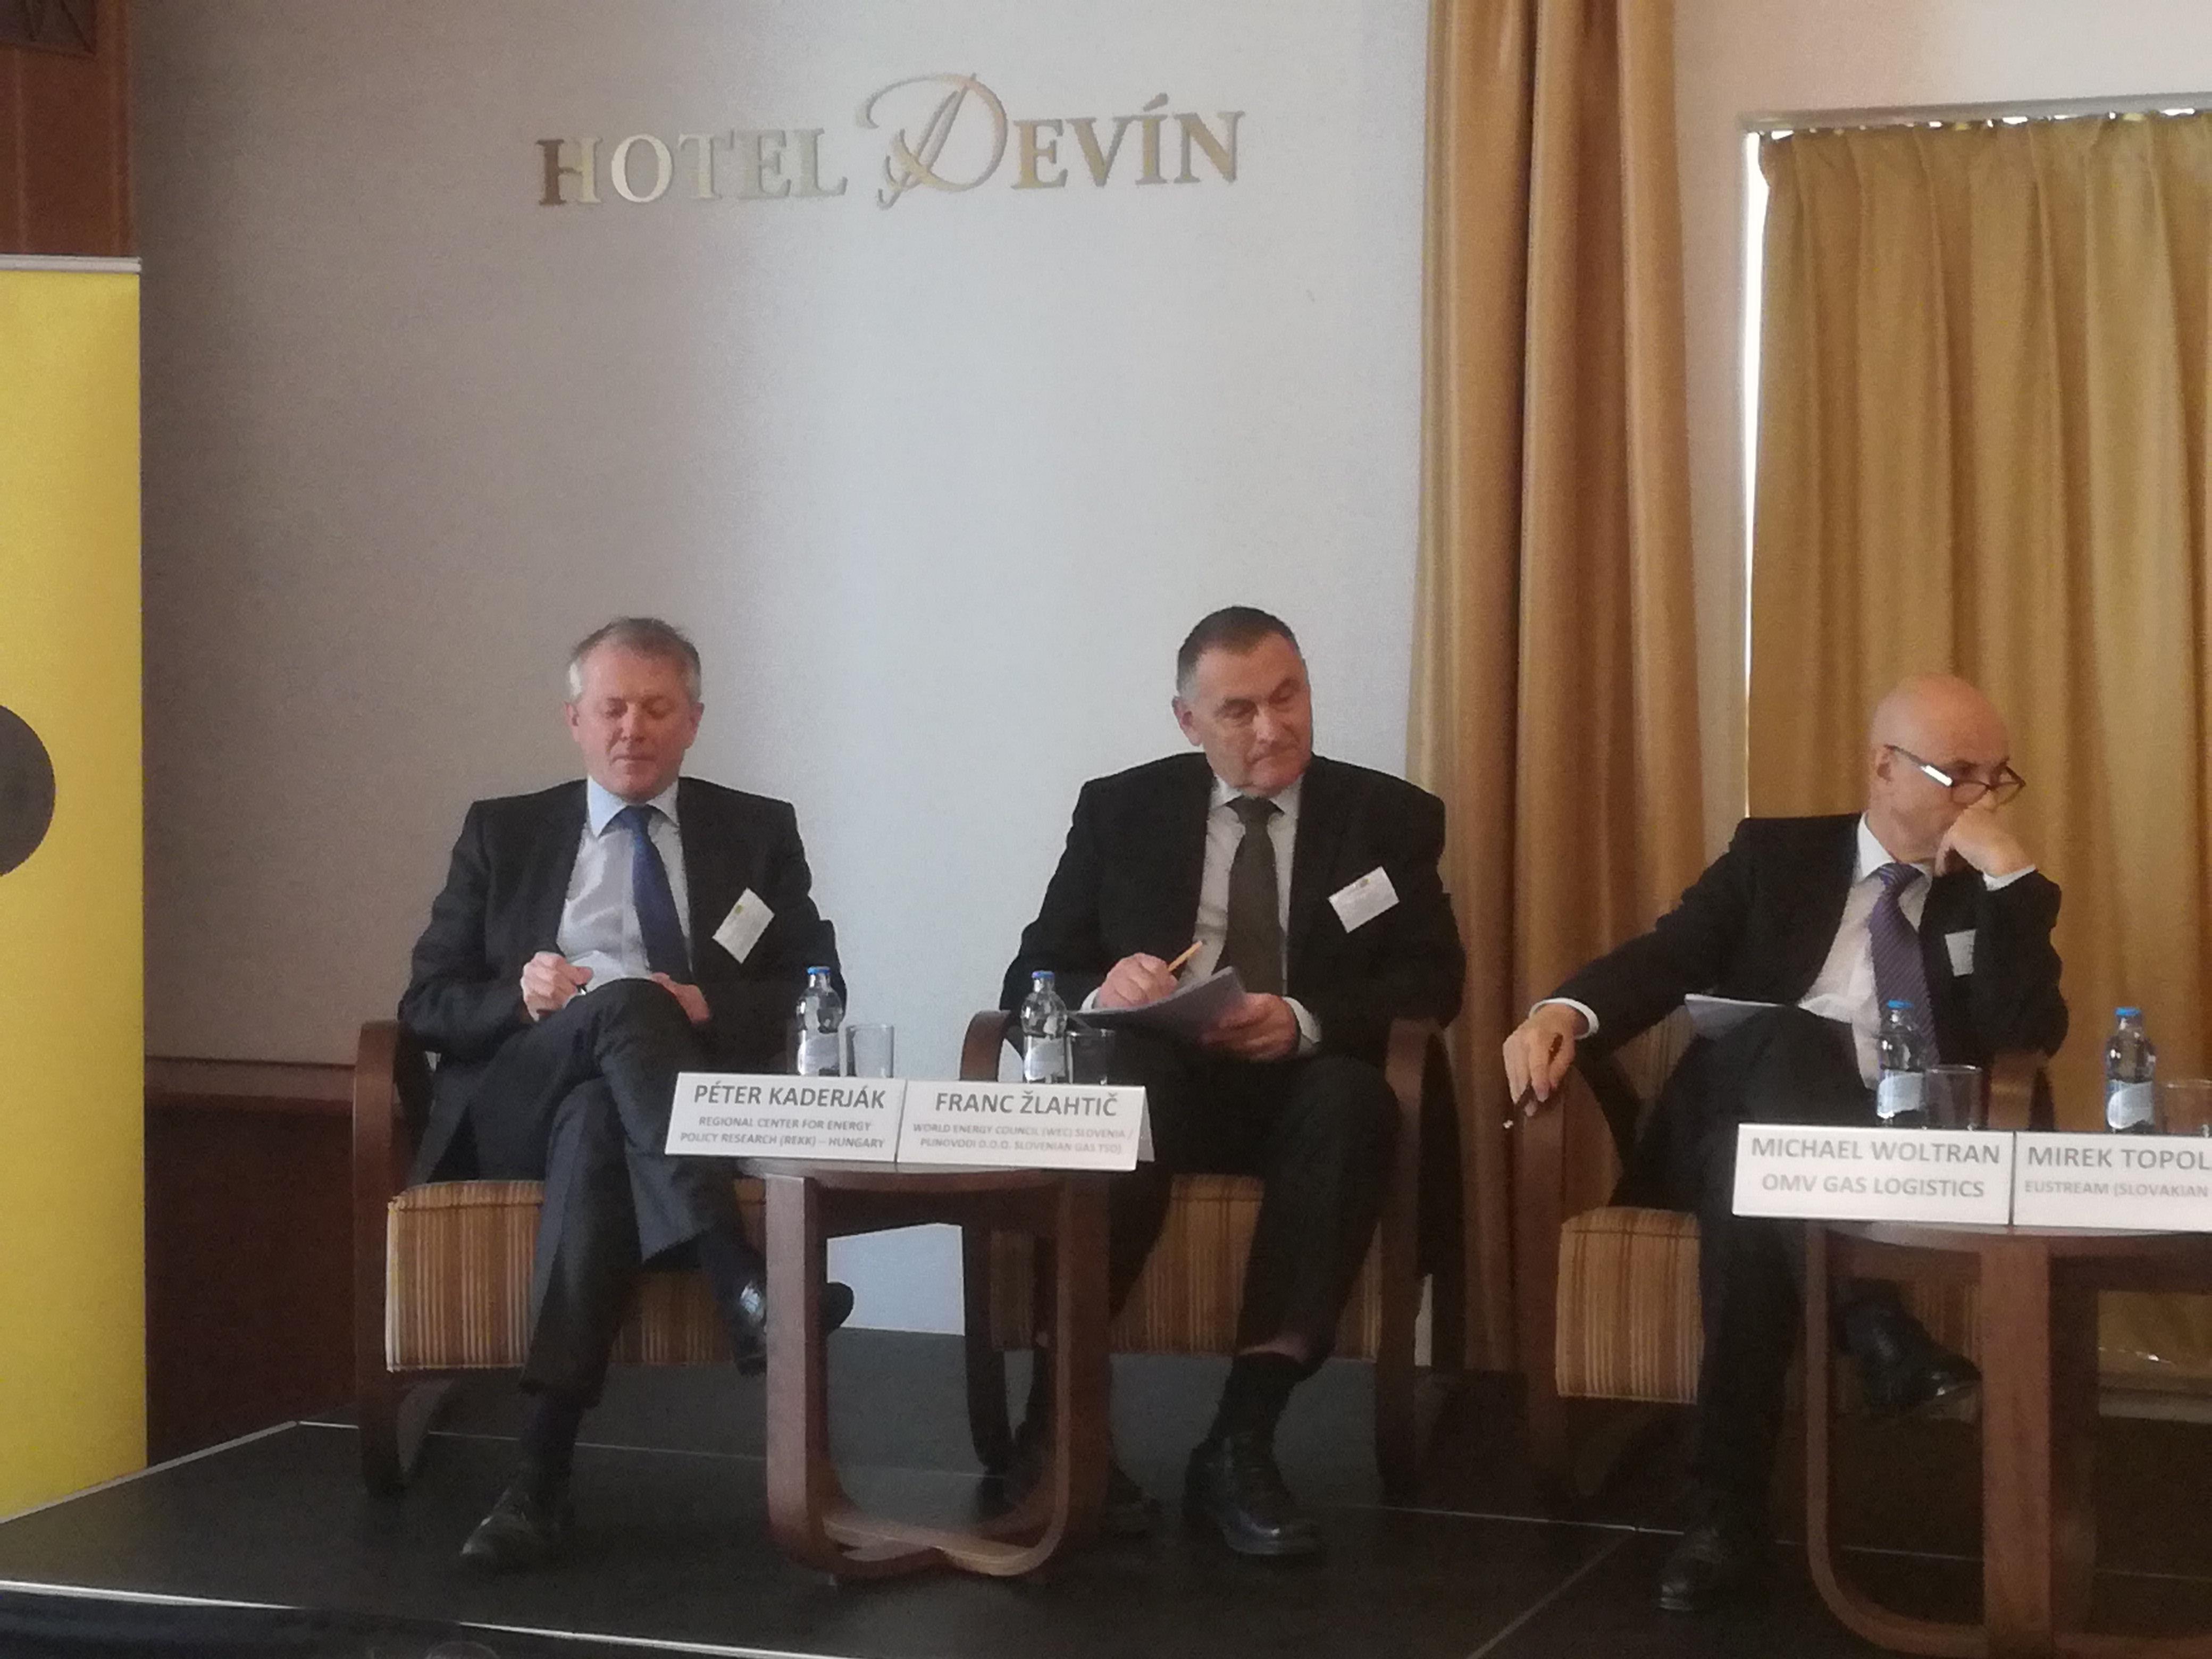 Zľava: Péter Kaderják, Franc Zlahtič, Michael Woltran